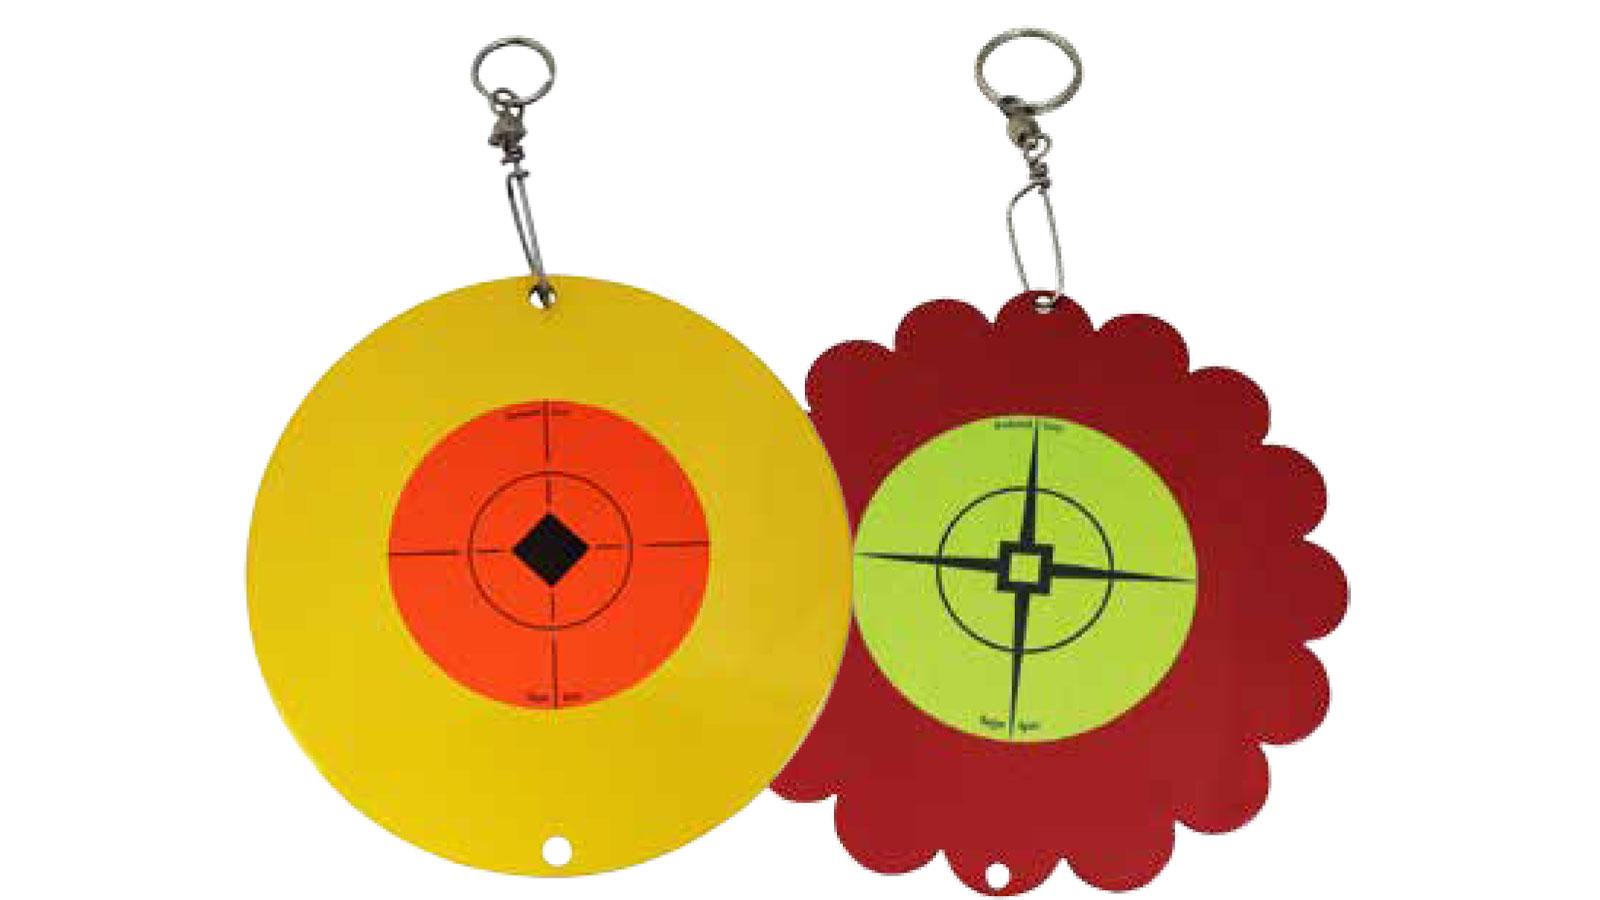 Birchwood Casey 47117 World of Targets Shoot-N-Spin Targets